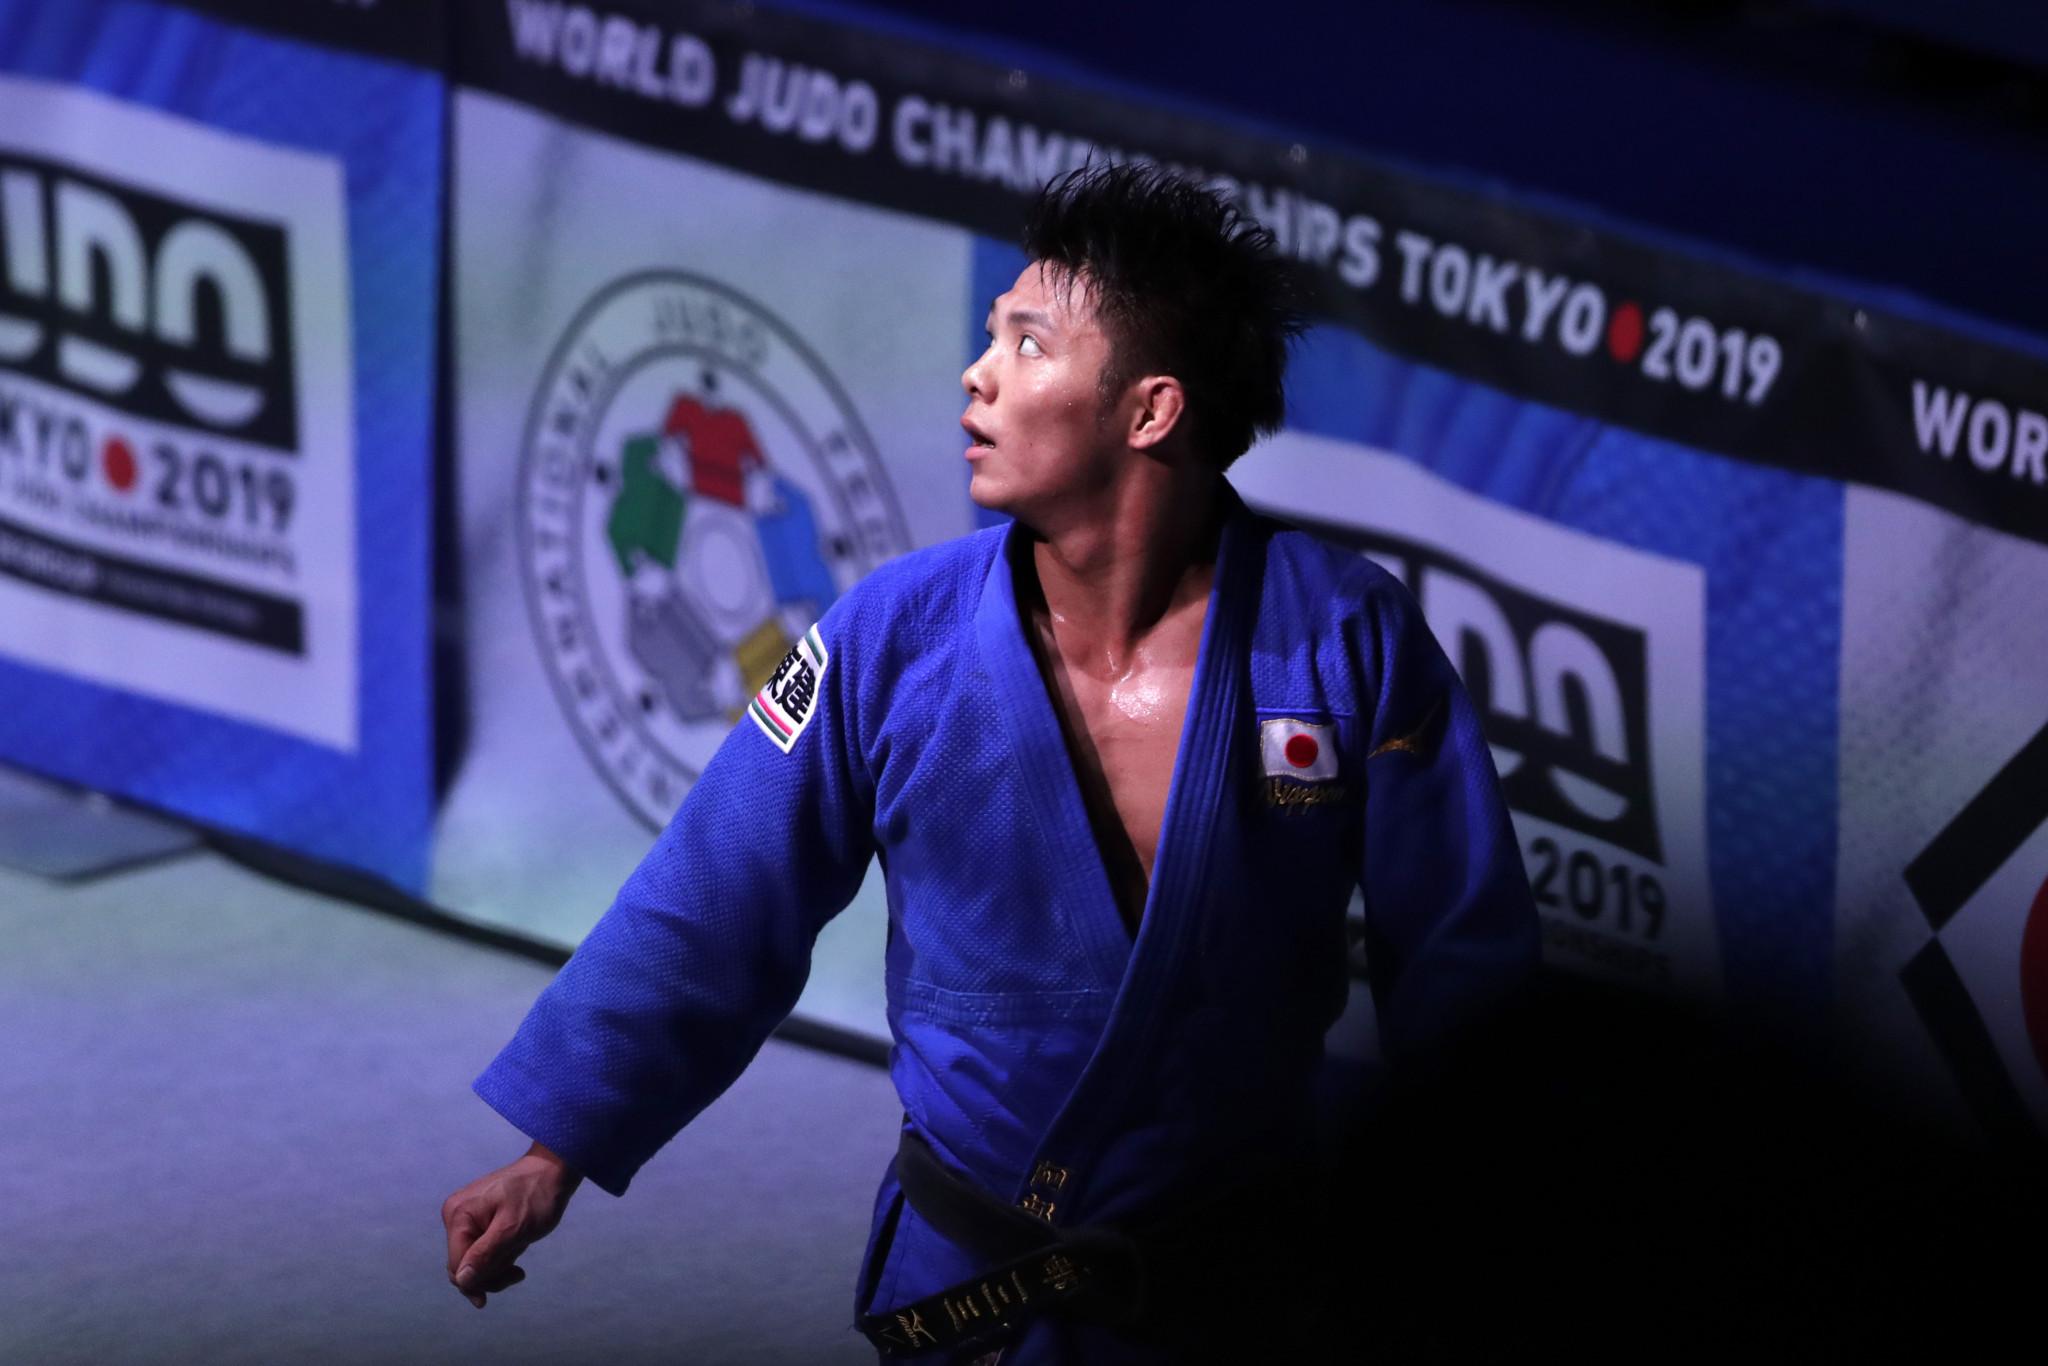 Hifumi Abe suffered defeat to compatriot Joshiro Maruyama in the semi final at Nippon Budokan ©Getty Images